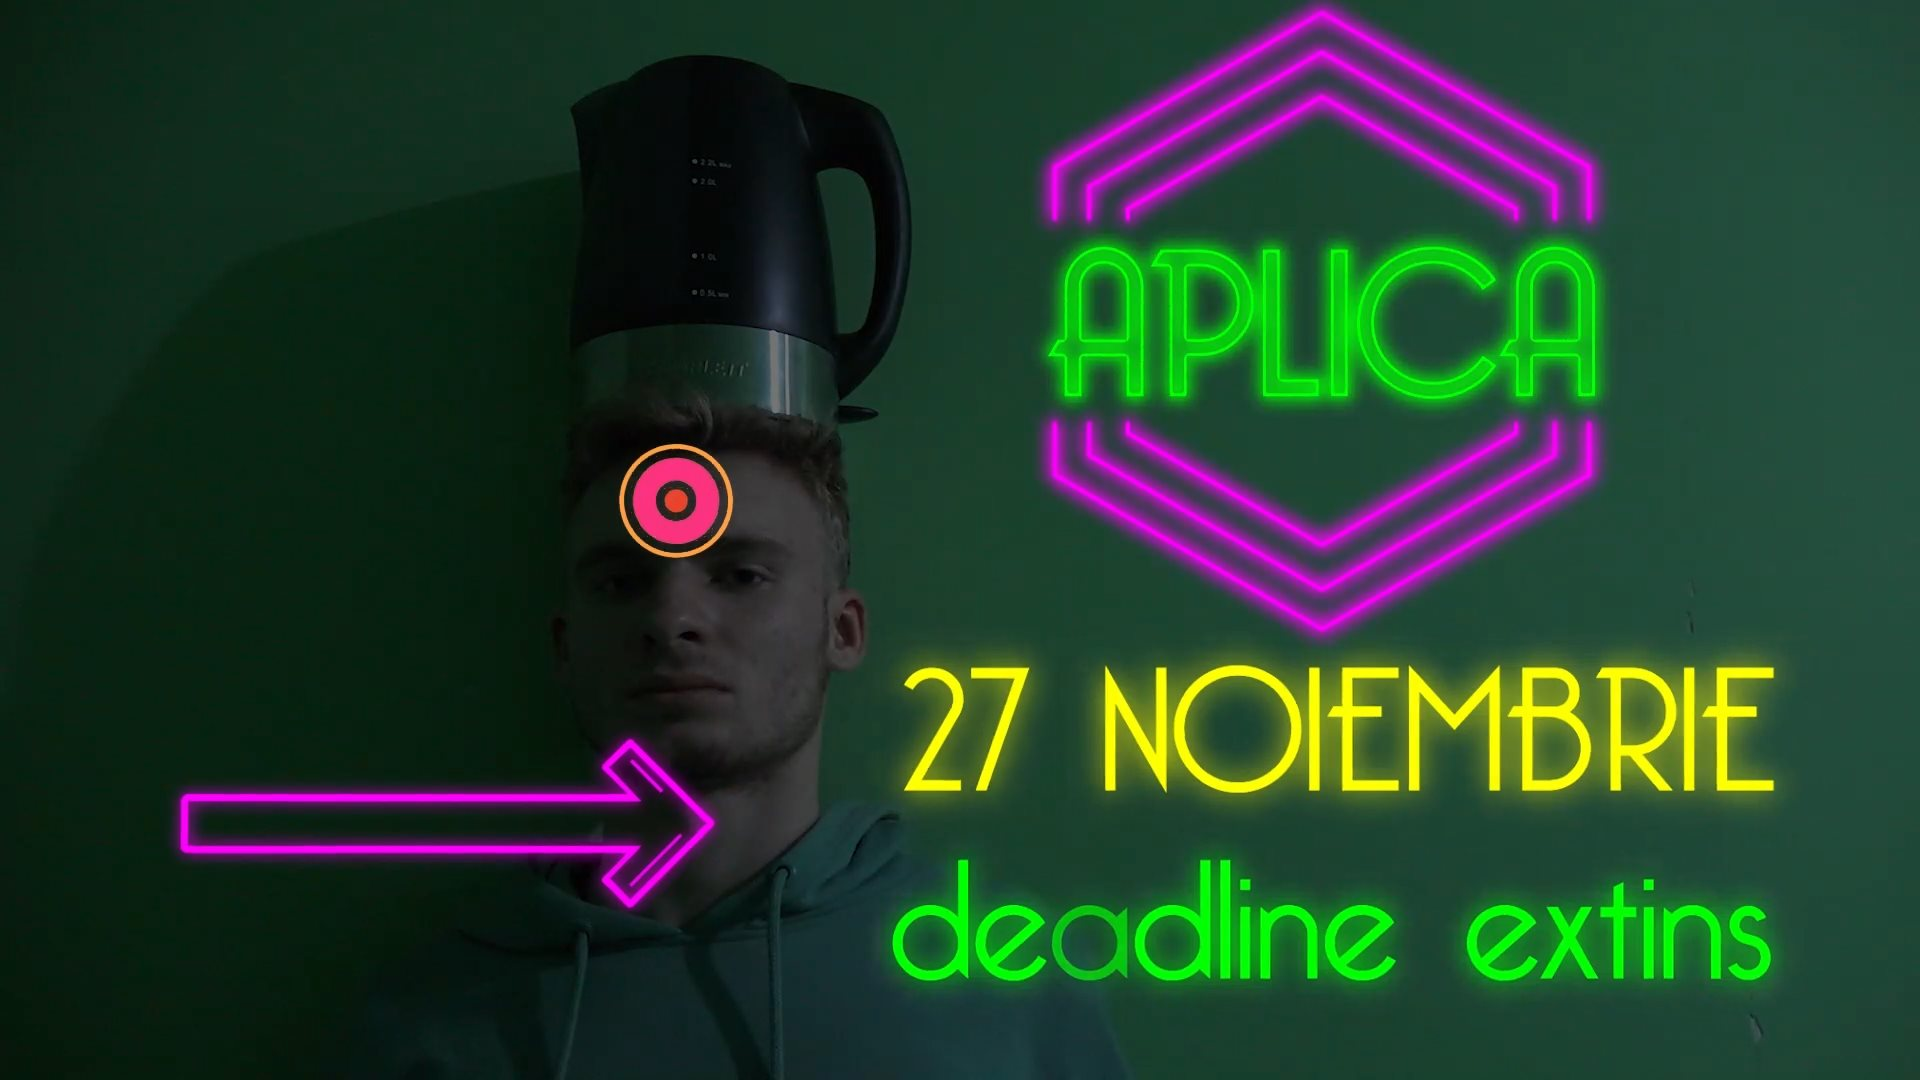 Registration deadline extension